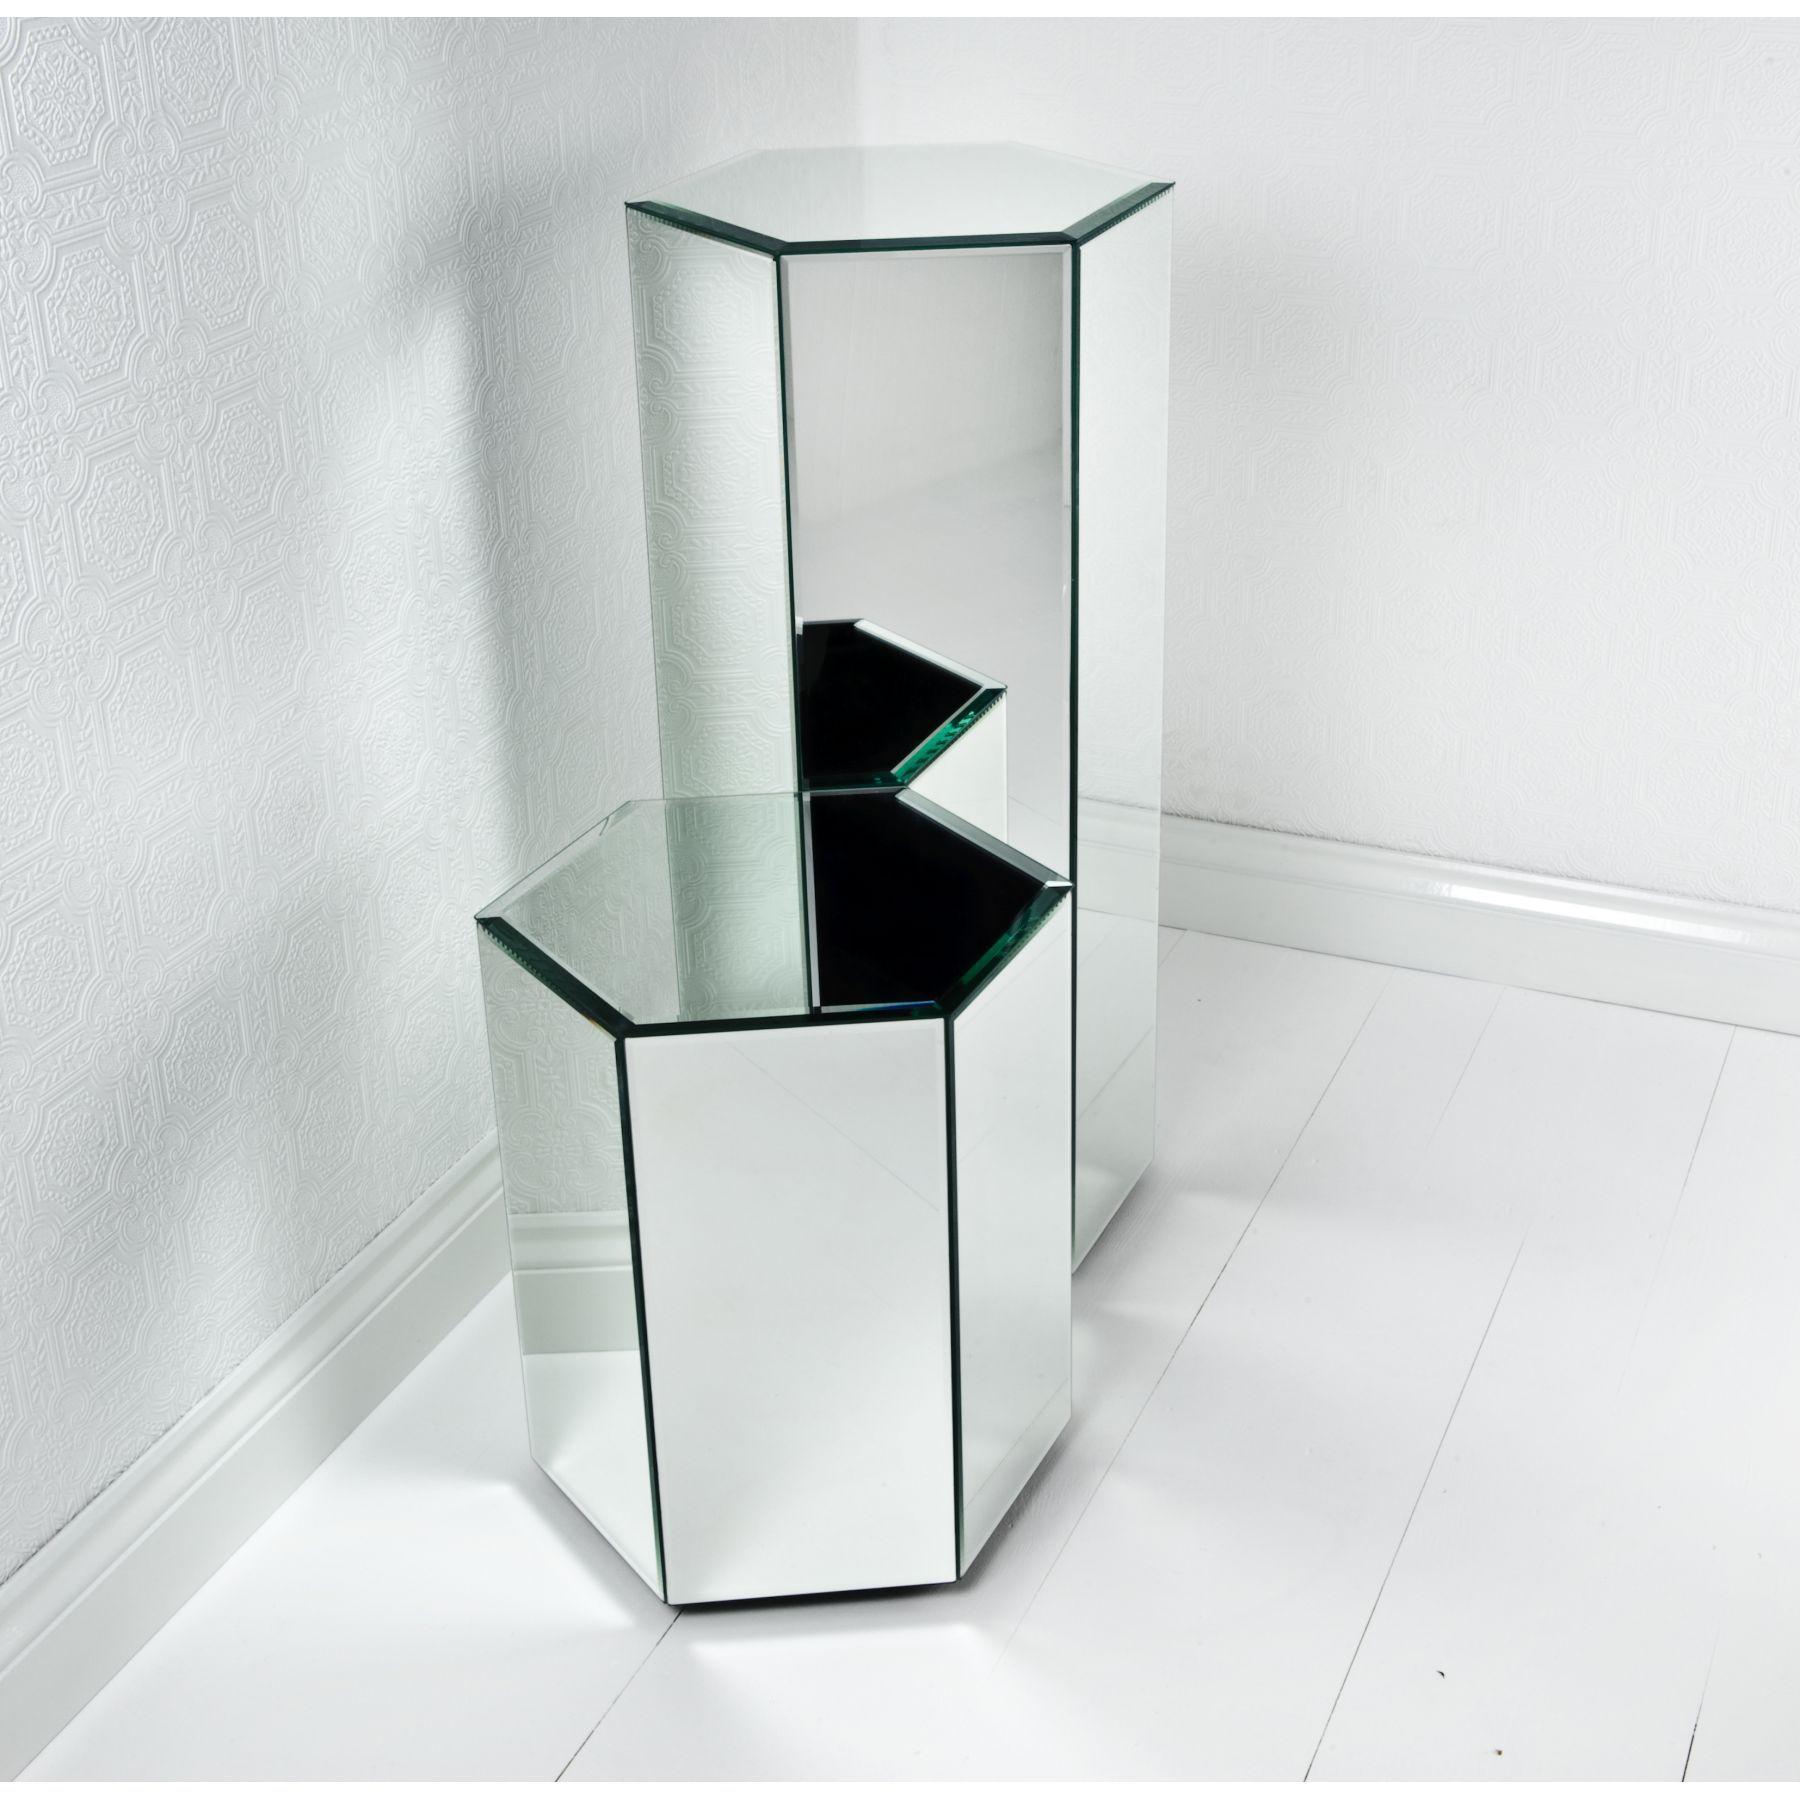 Mirrored octahedron shape pedestal set furniture must have mirrored octahedron shape pedestal set reviewsmspy